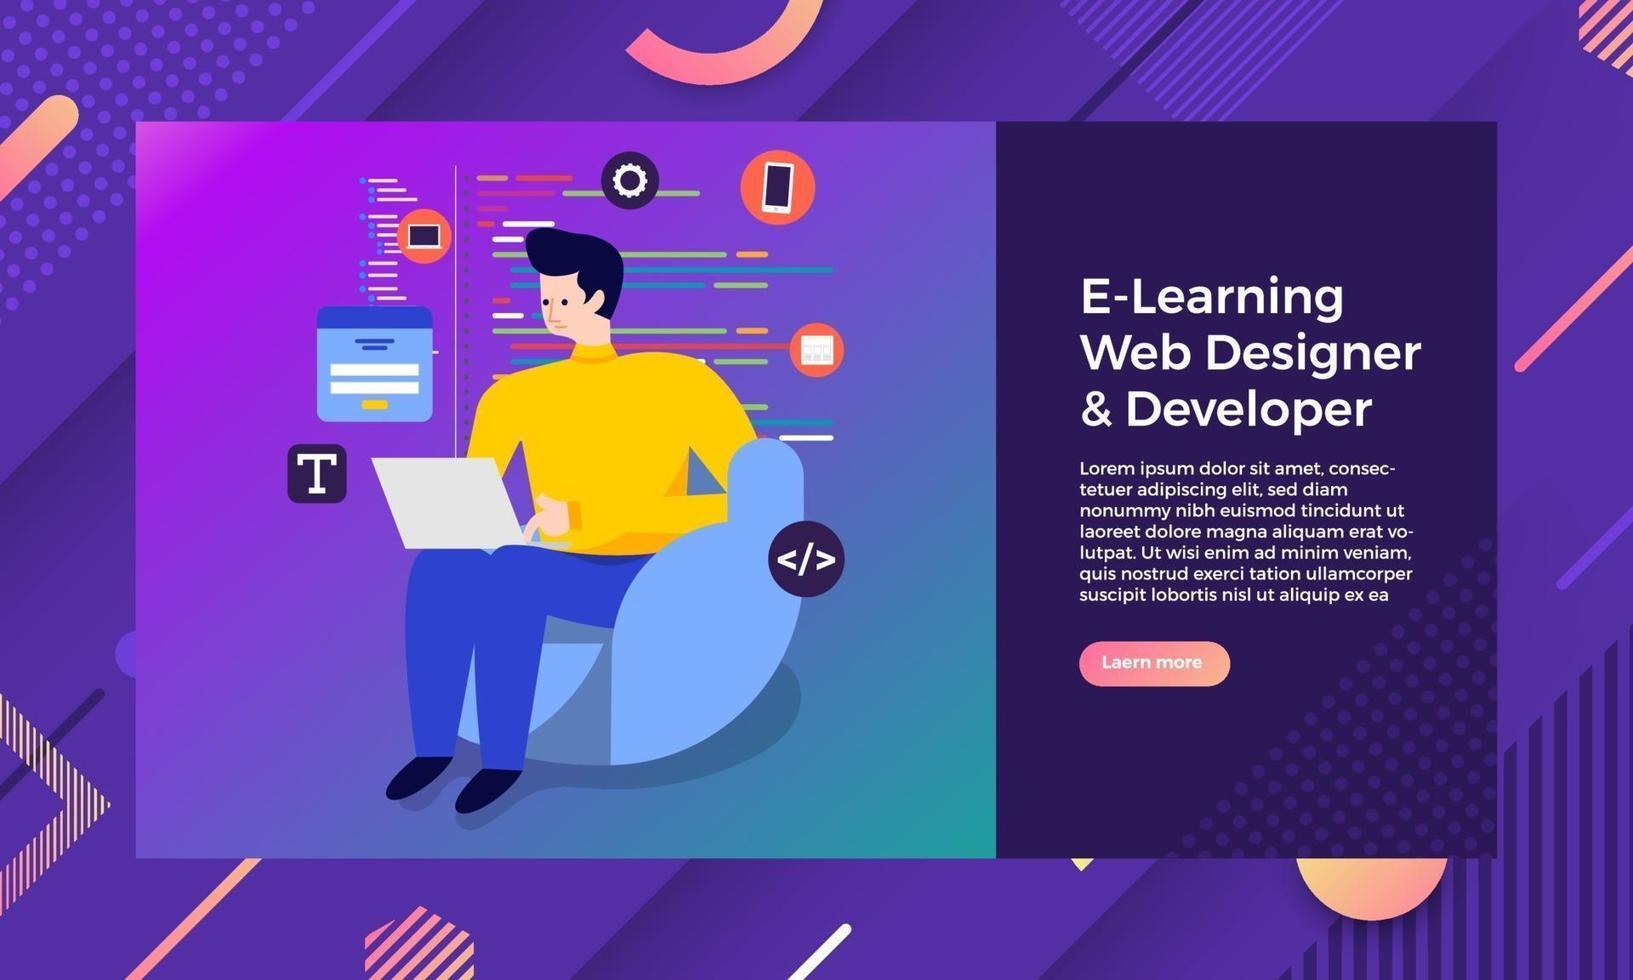 webdesigner ontwikkelaar vector